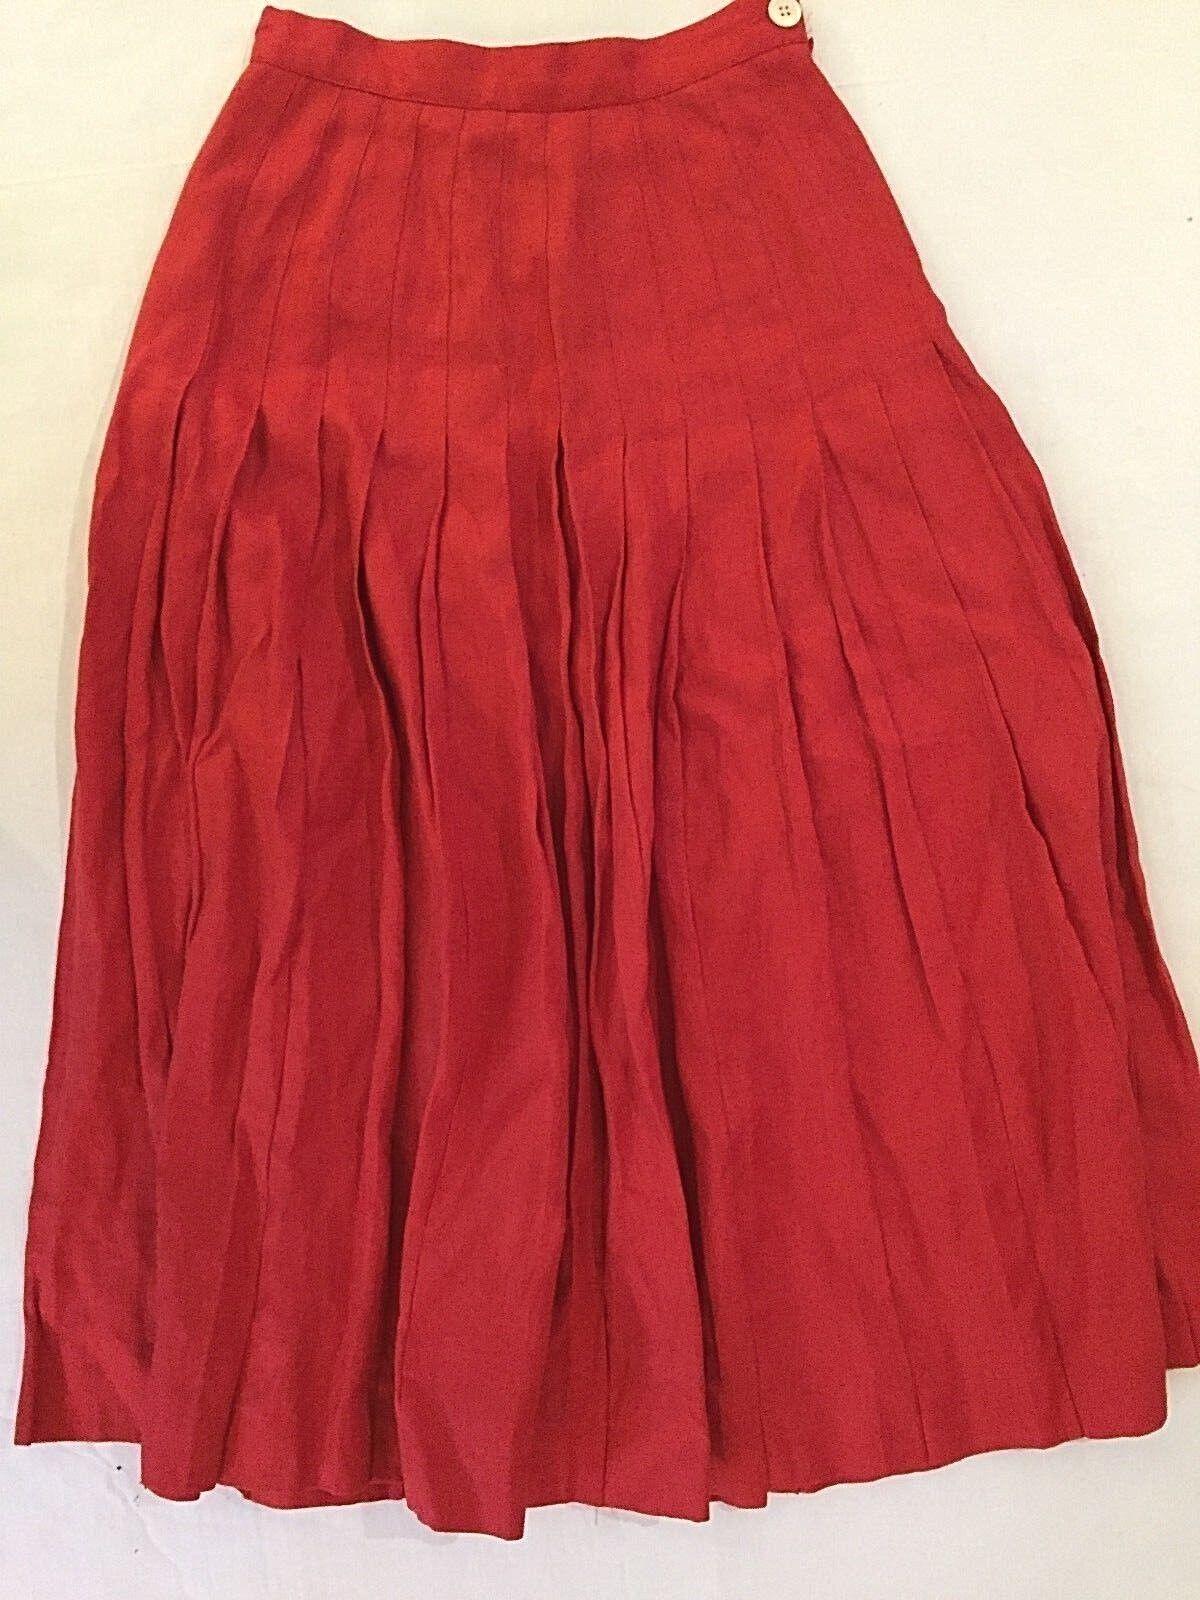 Perry Ellis Portfolio wmns sz 4 Red pleated dropwaist 100% linen maxi skirt EUC